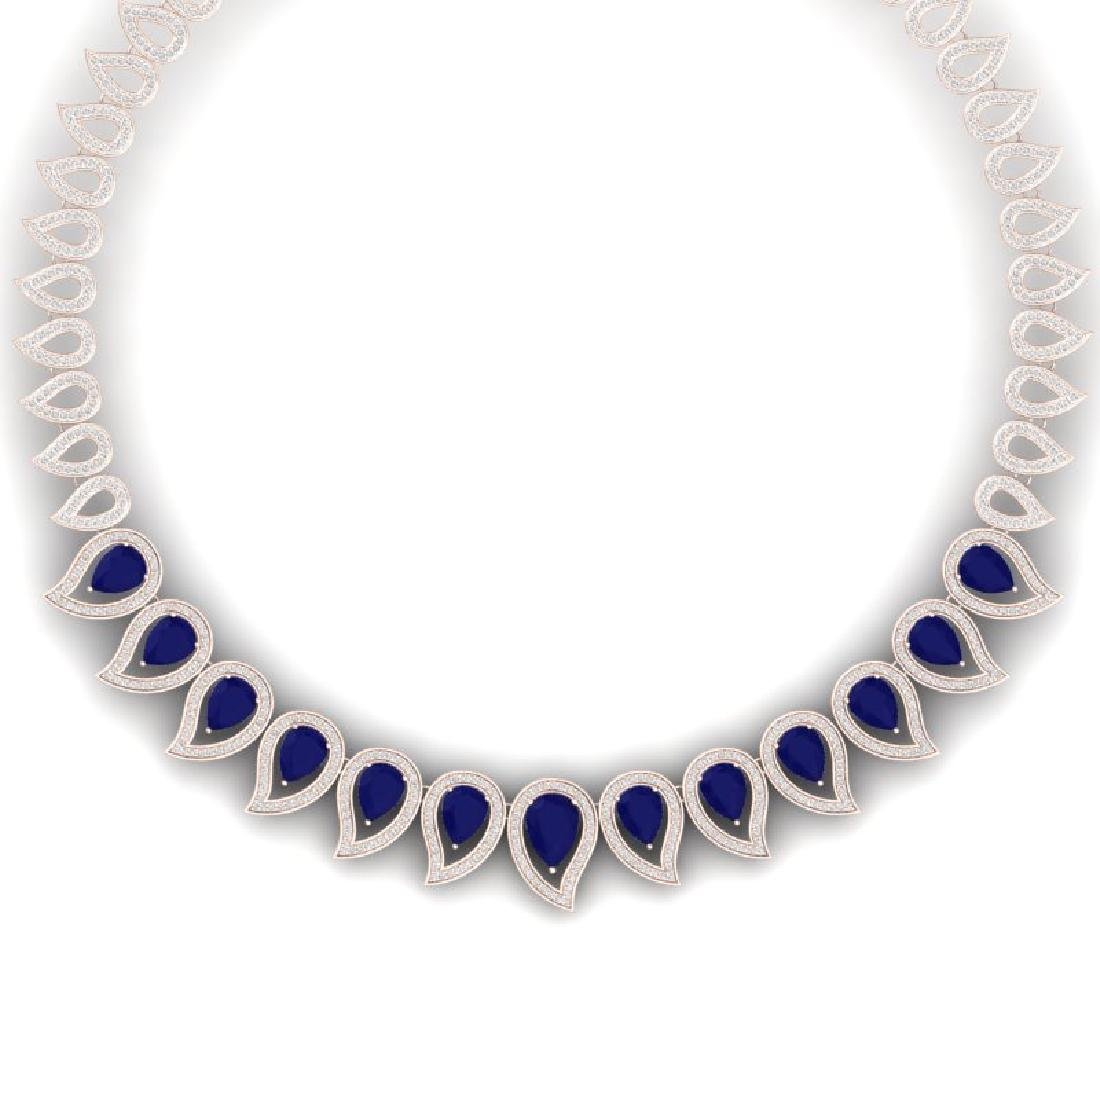 33.4 CTW Royalty Sapphire & VS Diamond Necklace 18K